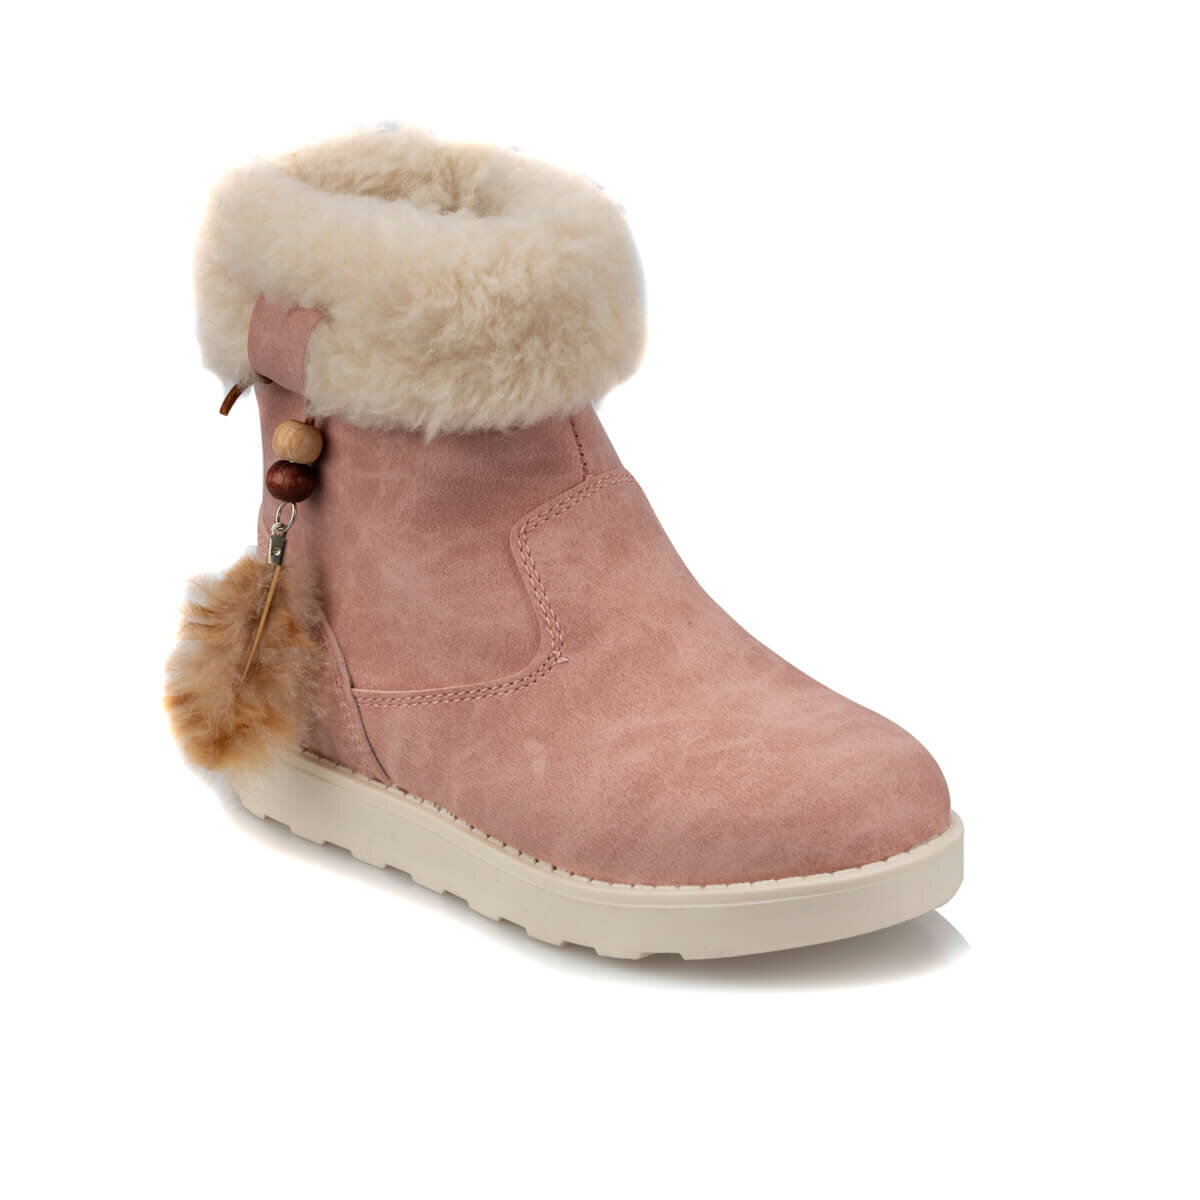 FLO 92.509829.P Pink Female Child Boots Polaris